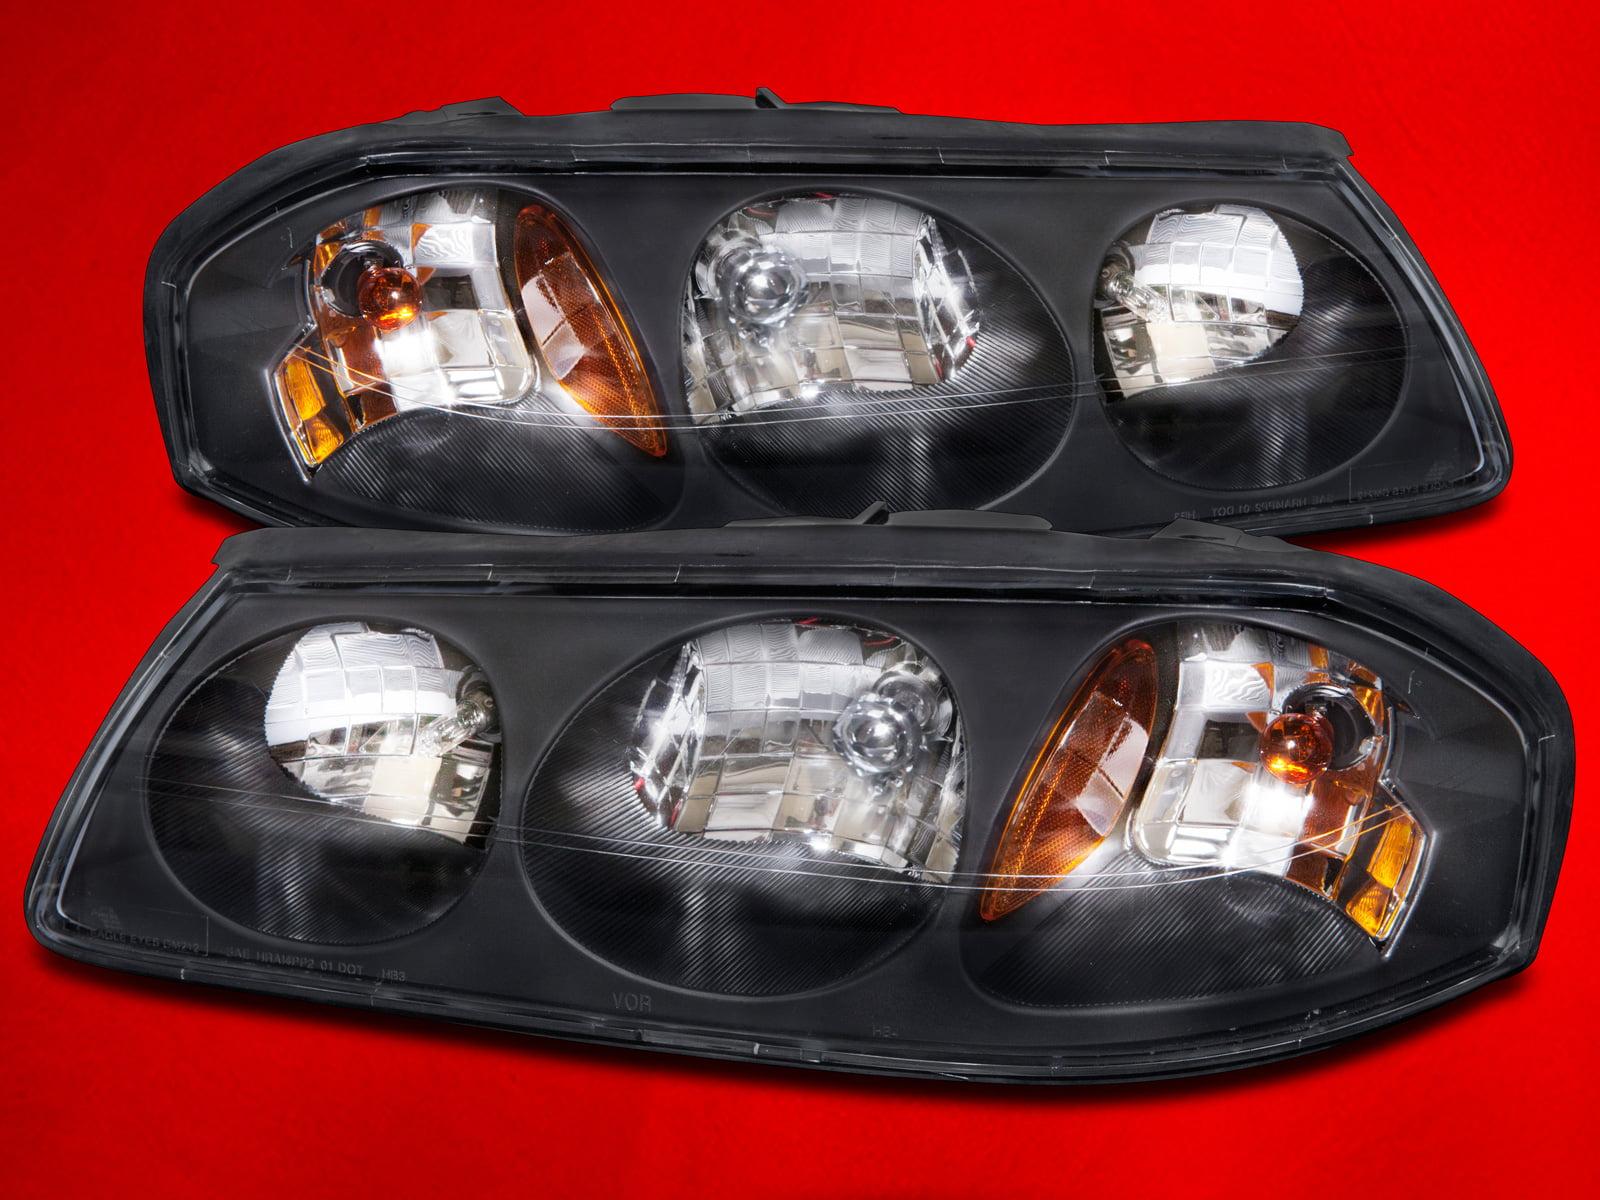 2000 2004 Chevy Impala Headlights Set W Xenon Bulbs Gm2502201 And Gm2503201